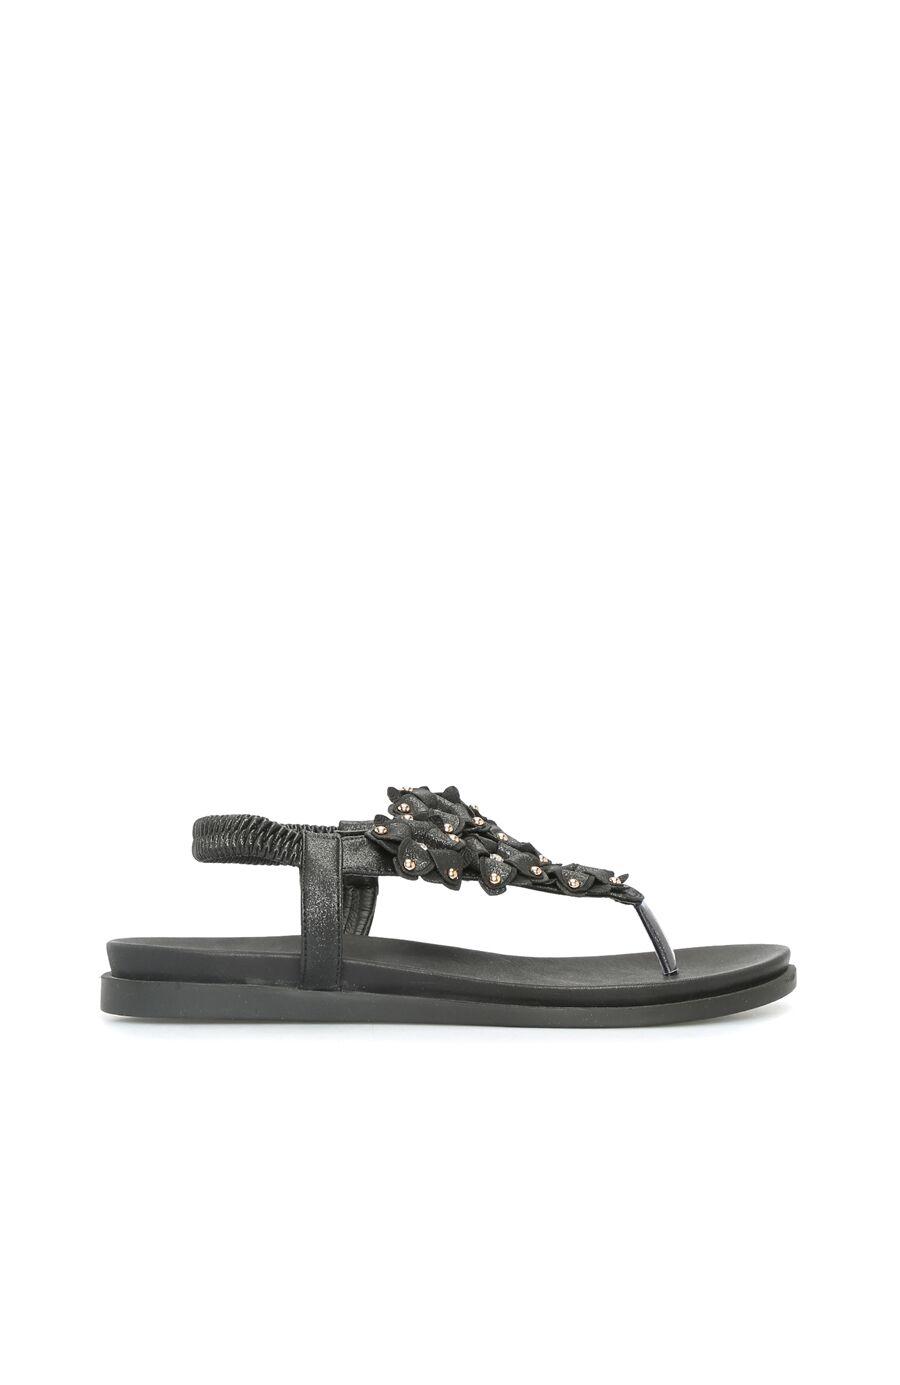 Dıvarese Troklu Siyah Sandalet – 299.5 TL